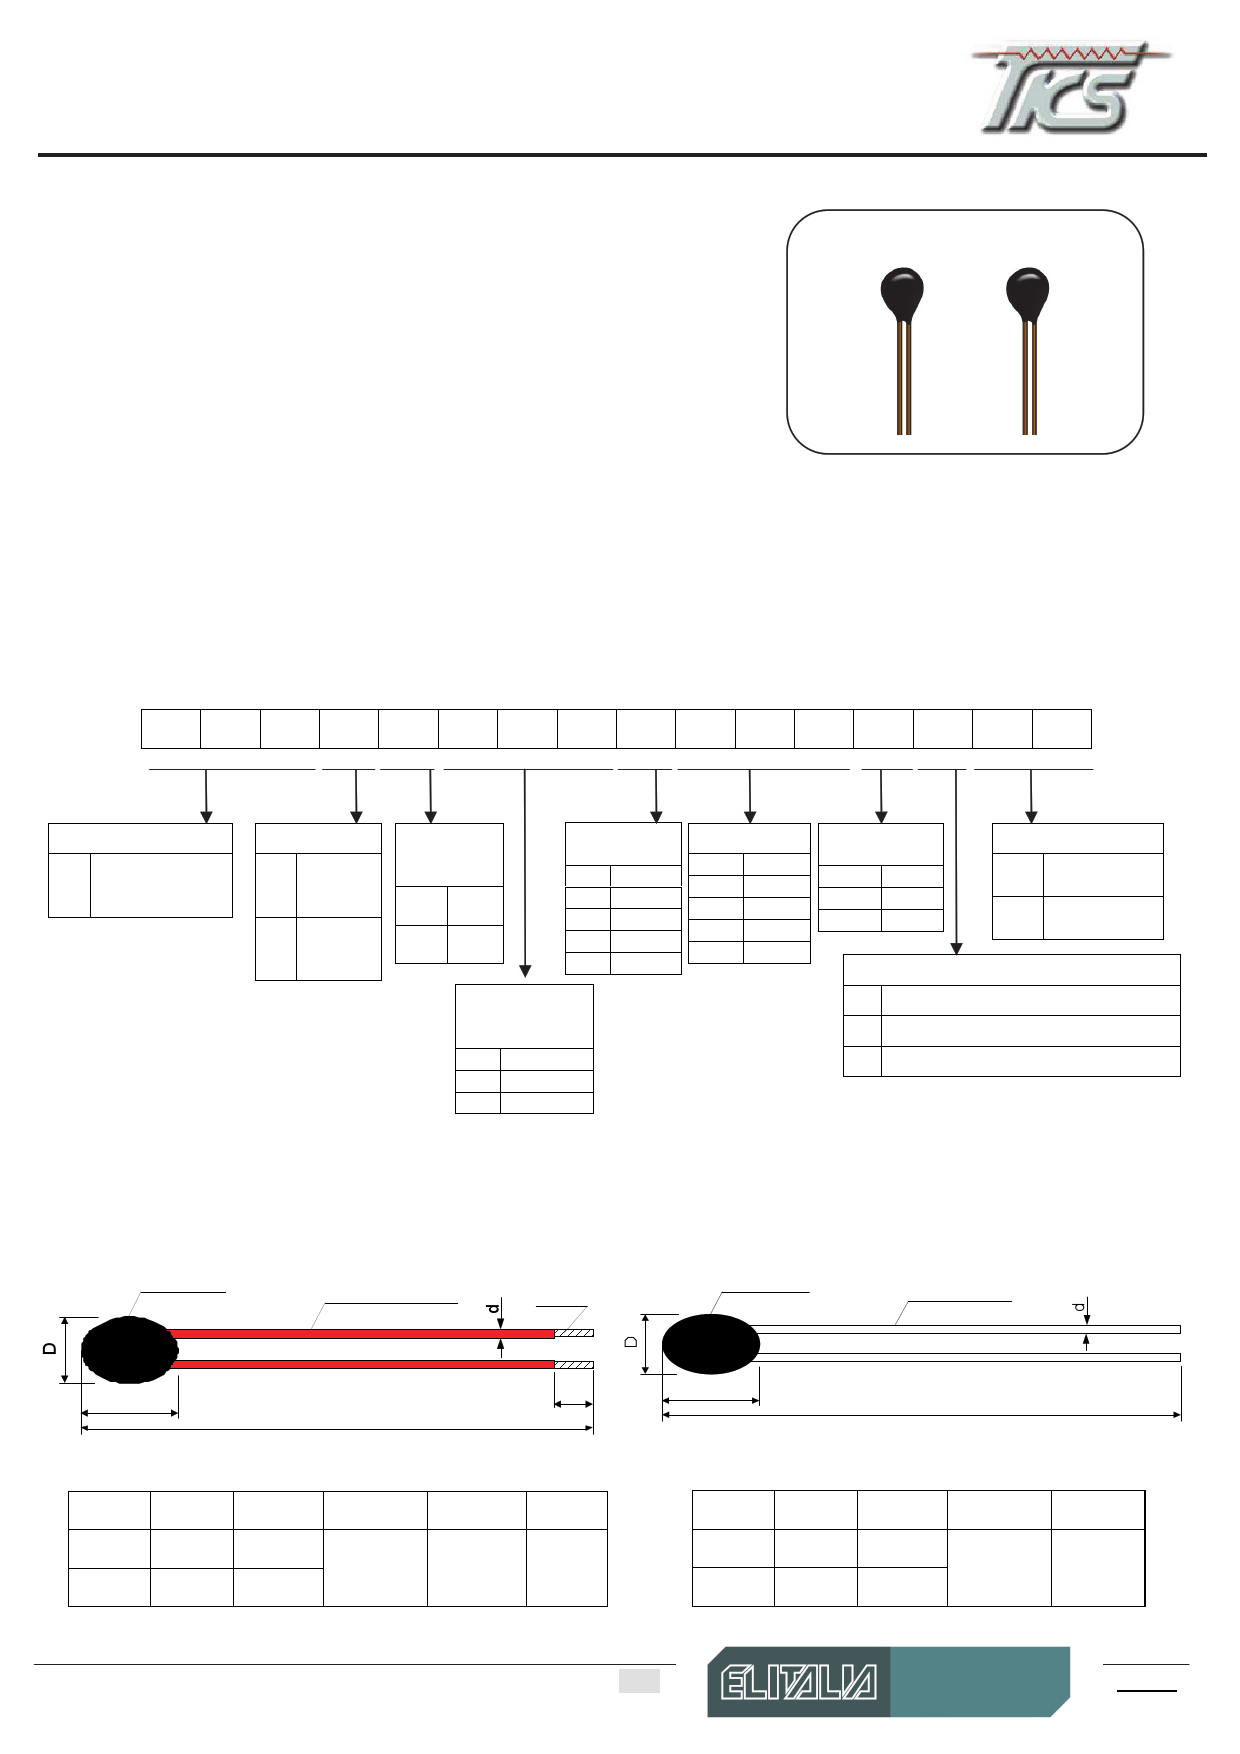 TTS2B104 datasheet, circuit